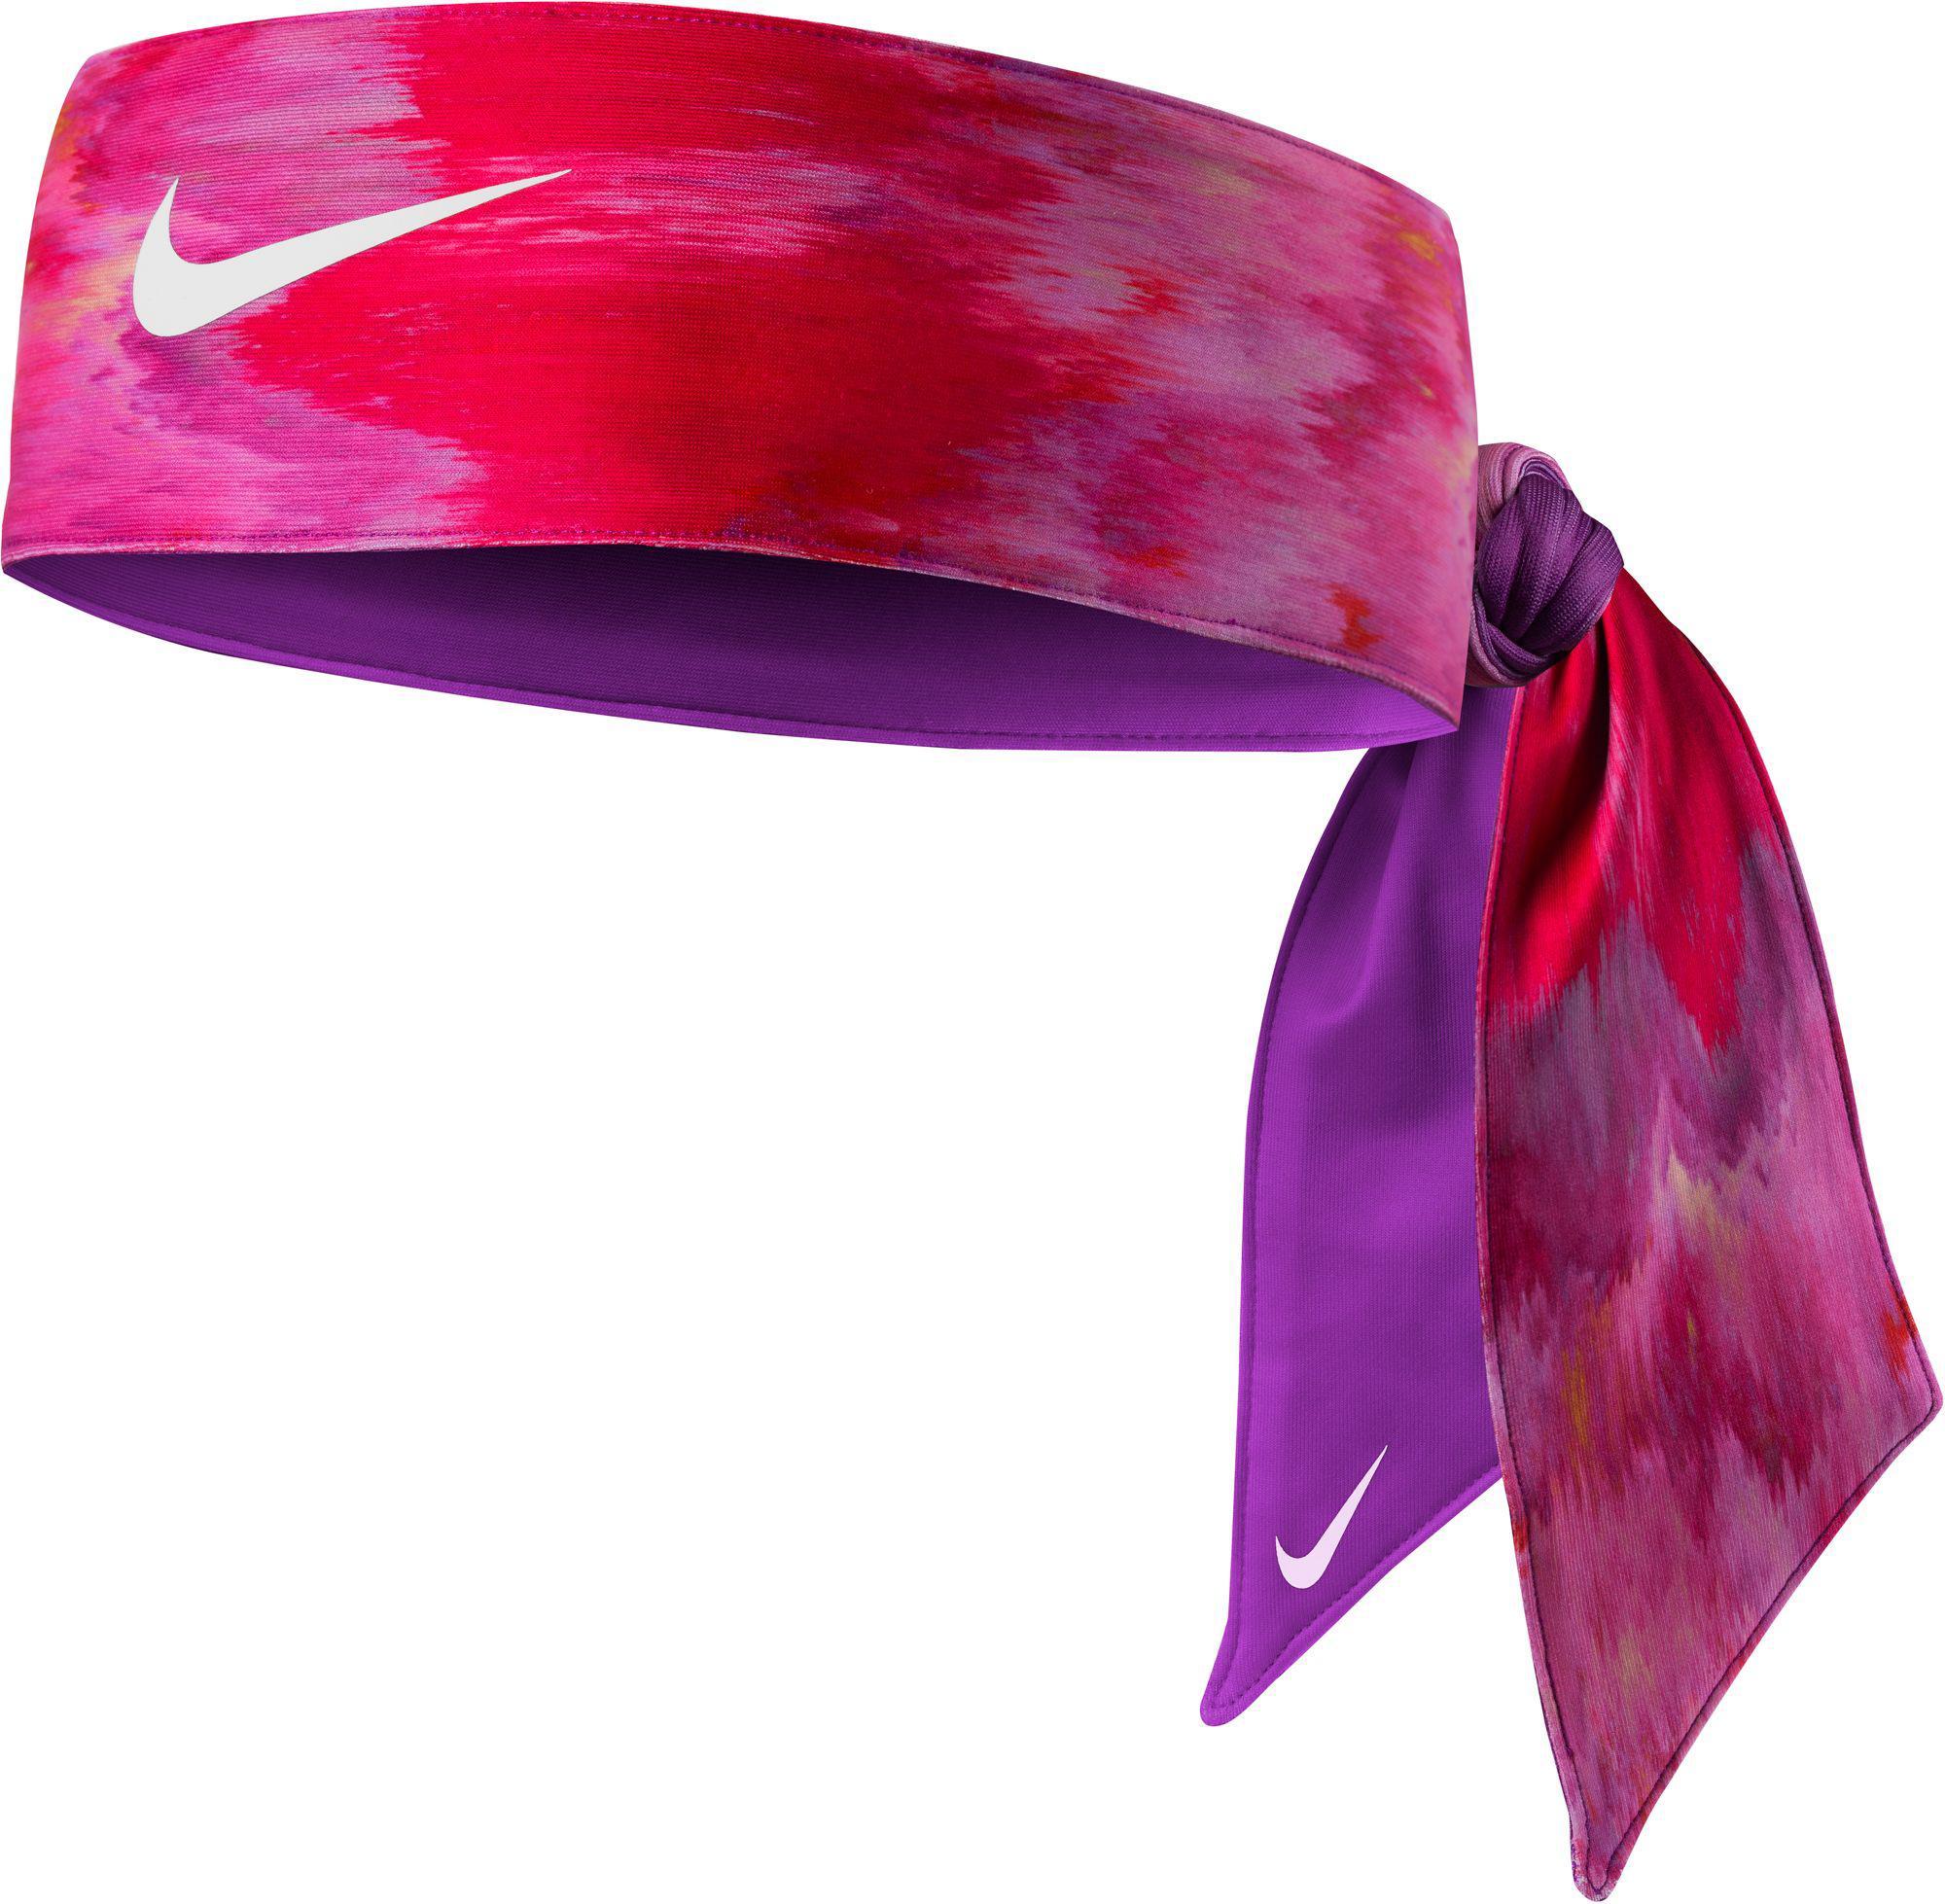 de627aef3cebc Nike Dri-fit Head Tie 3.0 - Lyst